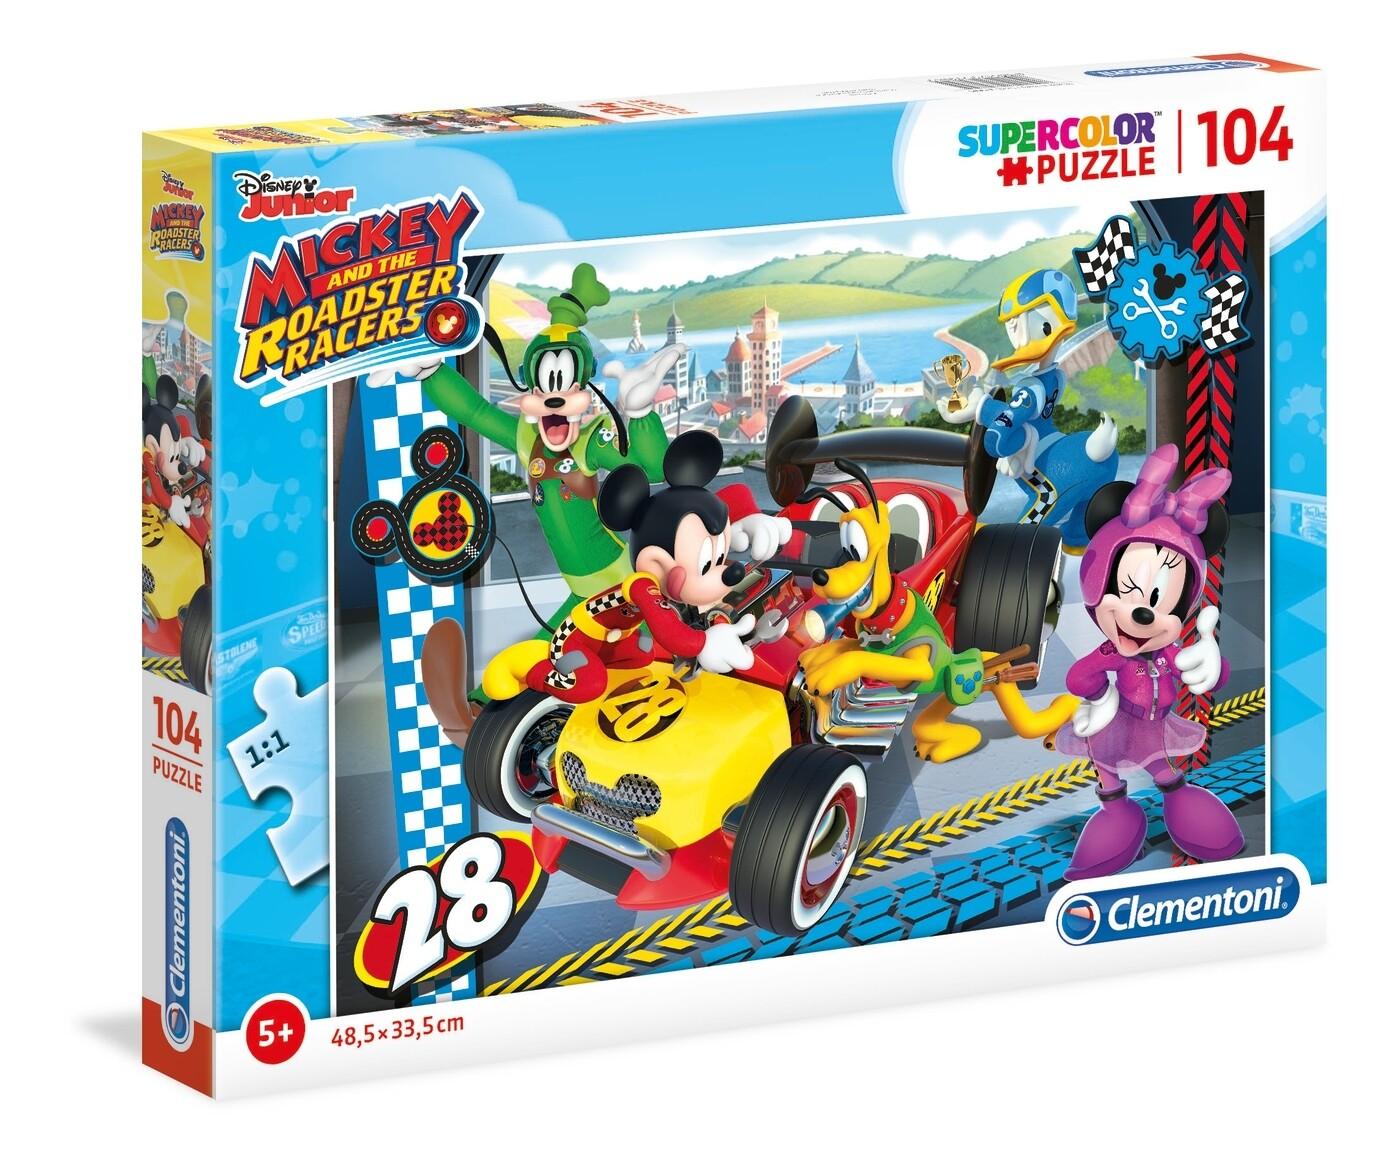 PUZZLE Super 104 pcs Mickey - Disney -- CLEMENTONI